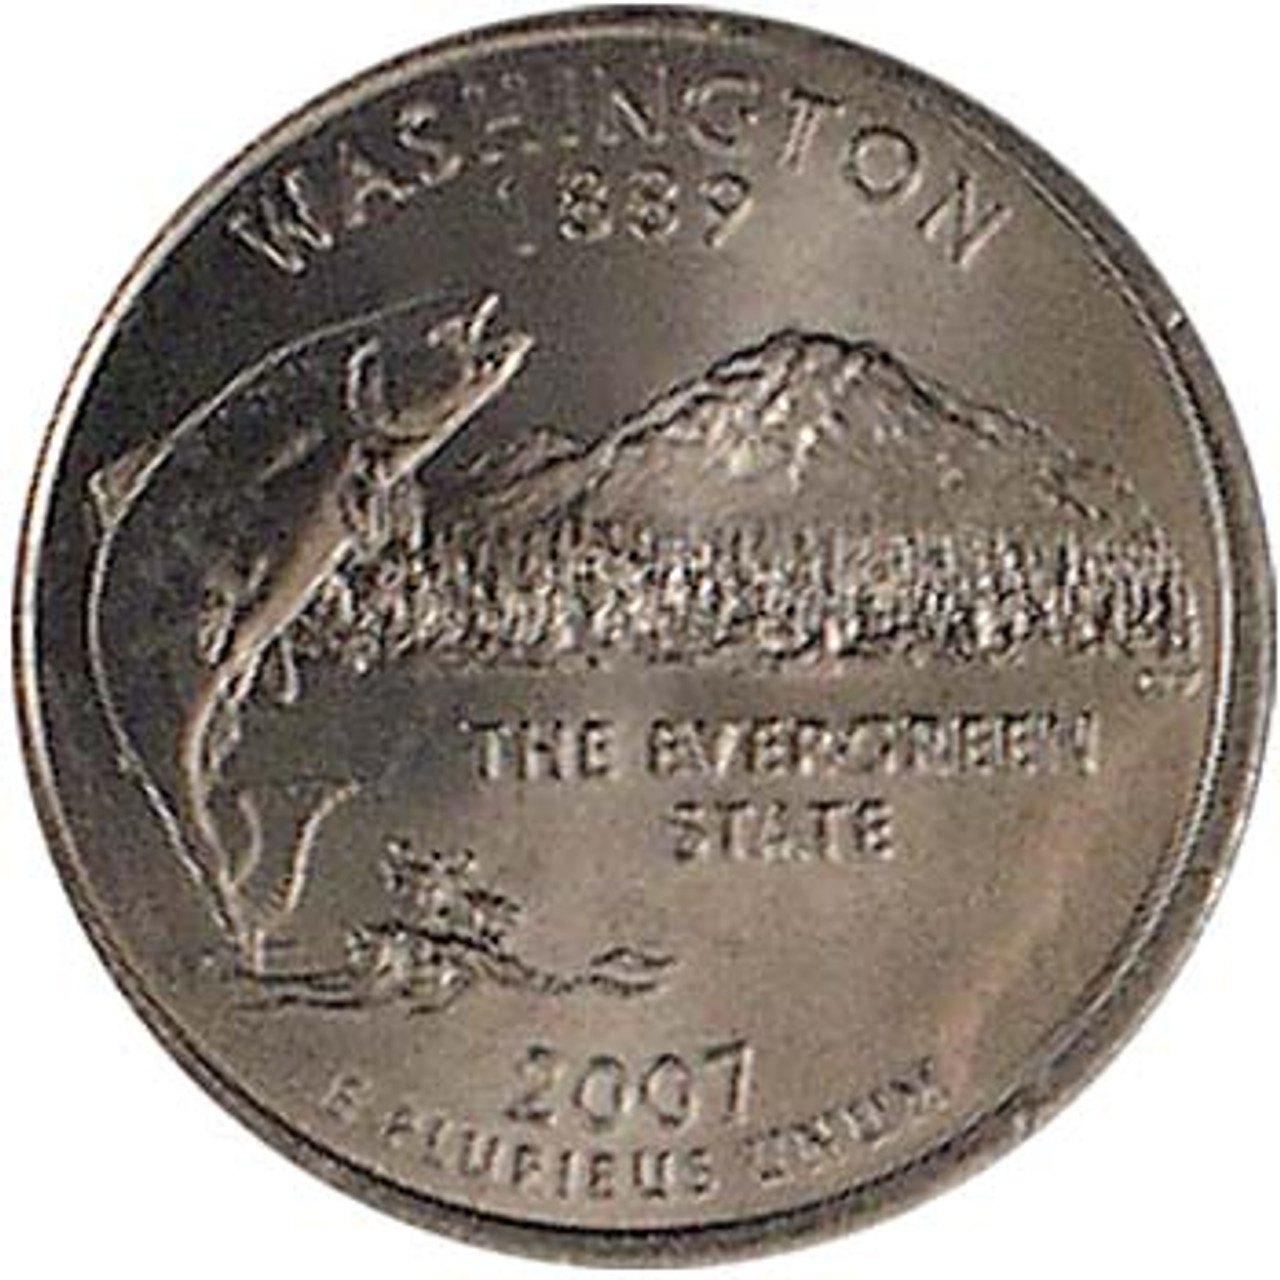 2007-P Washington Quarter Brilliant Uncirculated Image 1